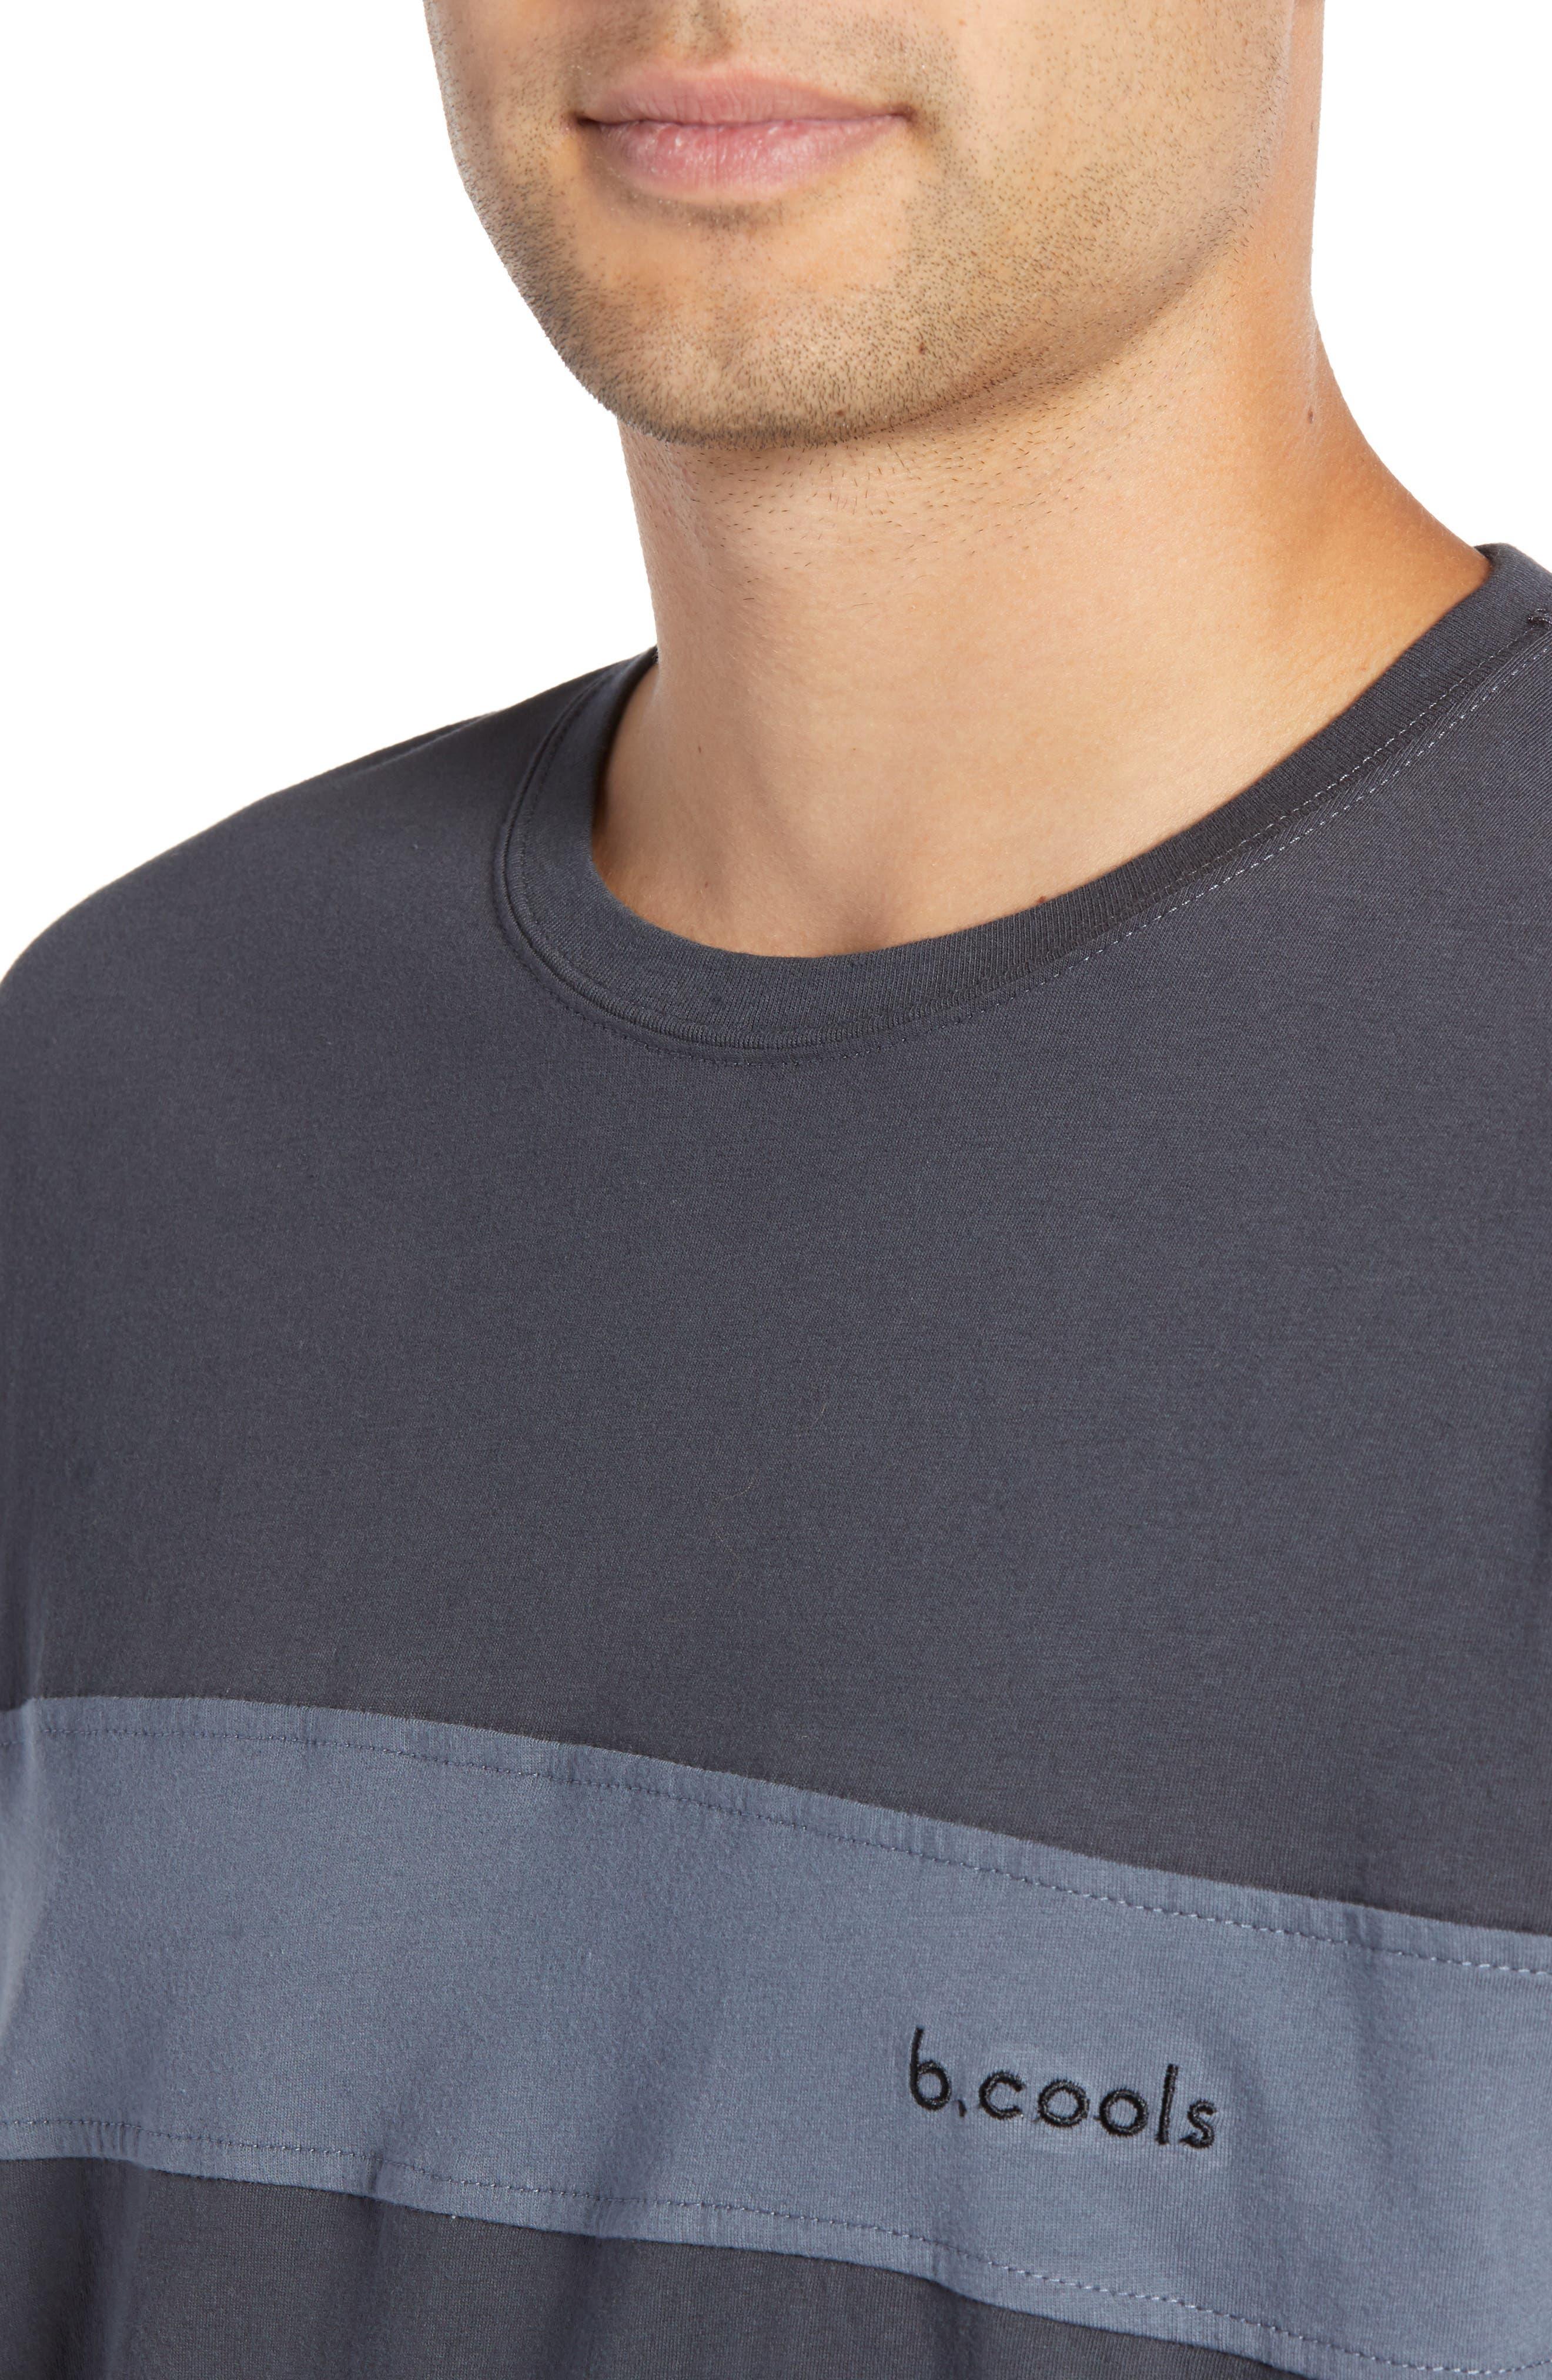 BARNEY COOLS,                             B Quick Colorblock Long Sleeve T-Shirt,                             Alternate thumbnail 4, color,                             001